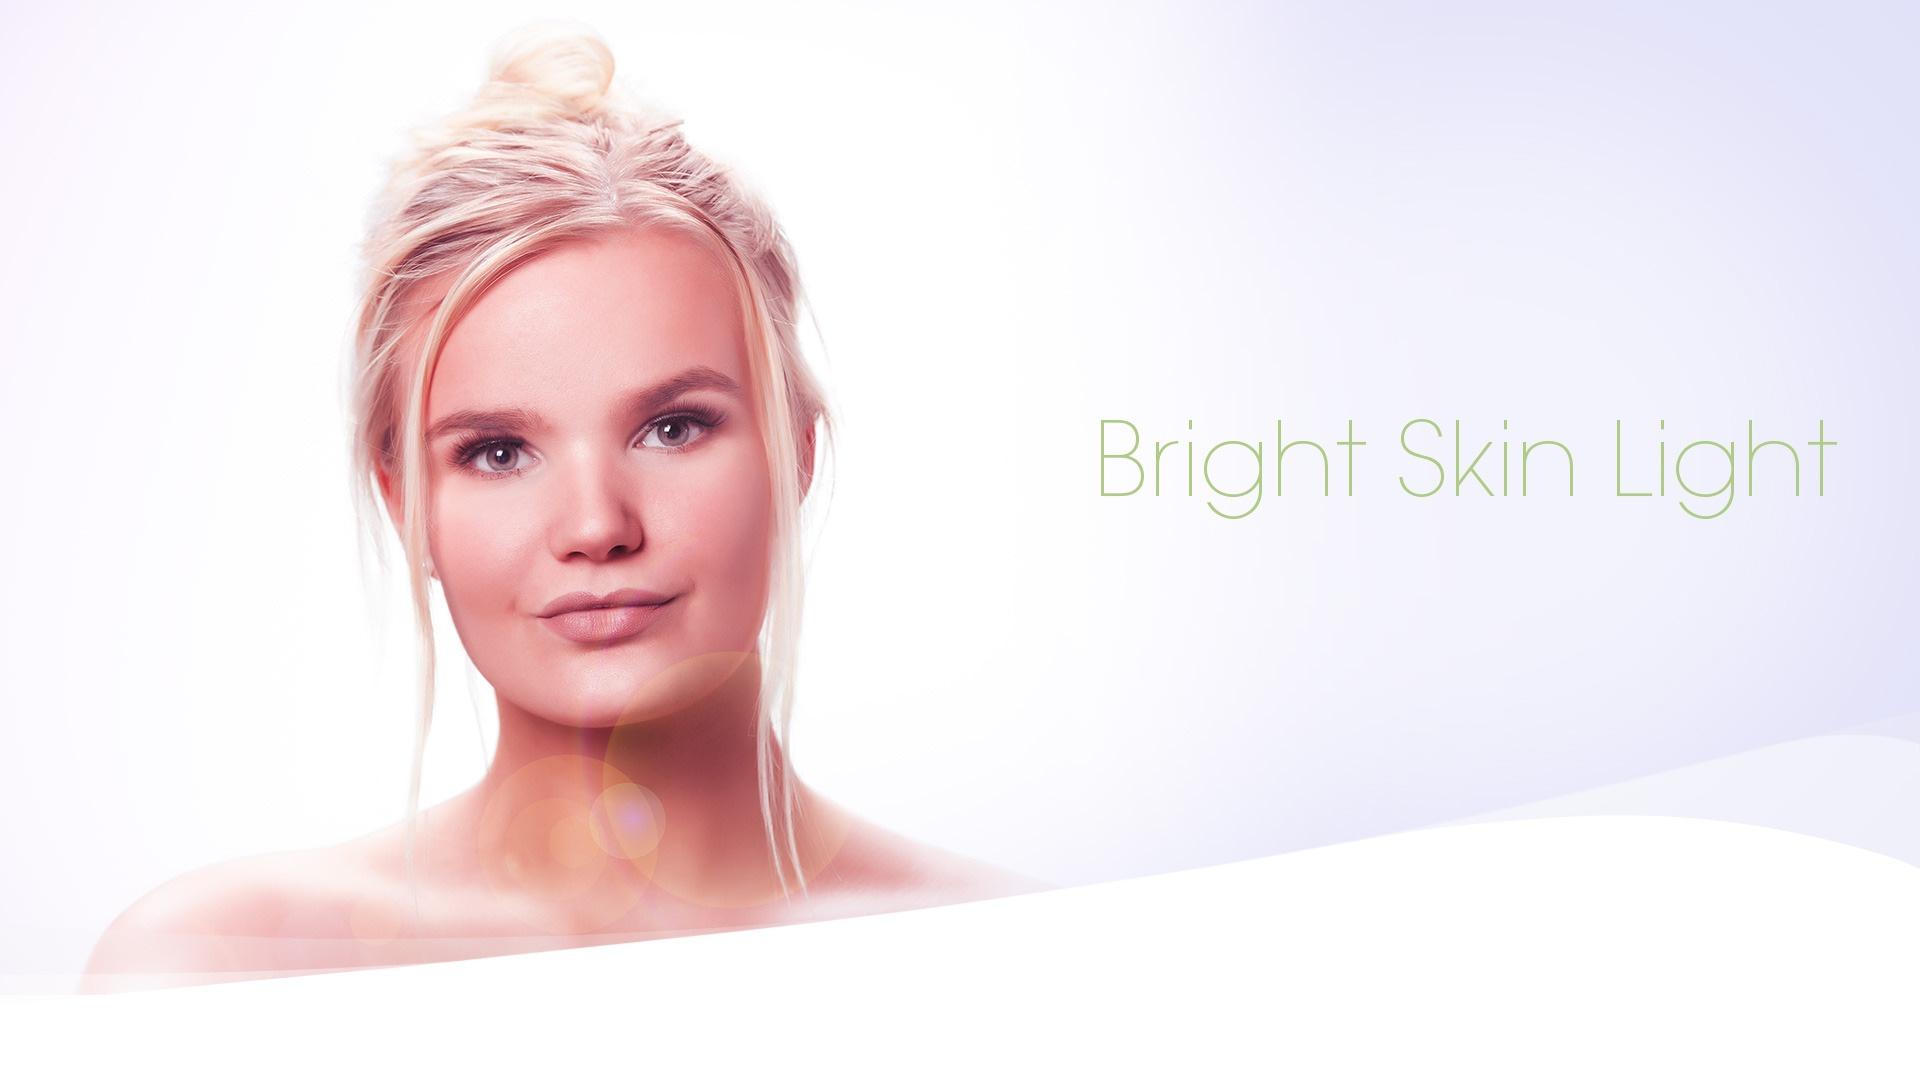 Bright Skin Light